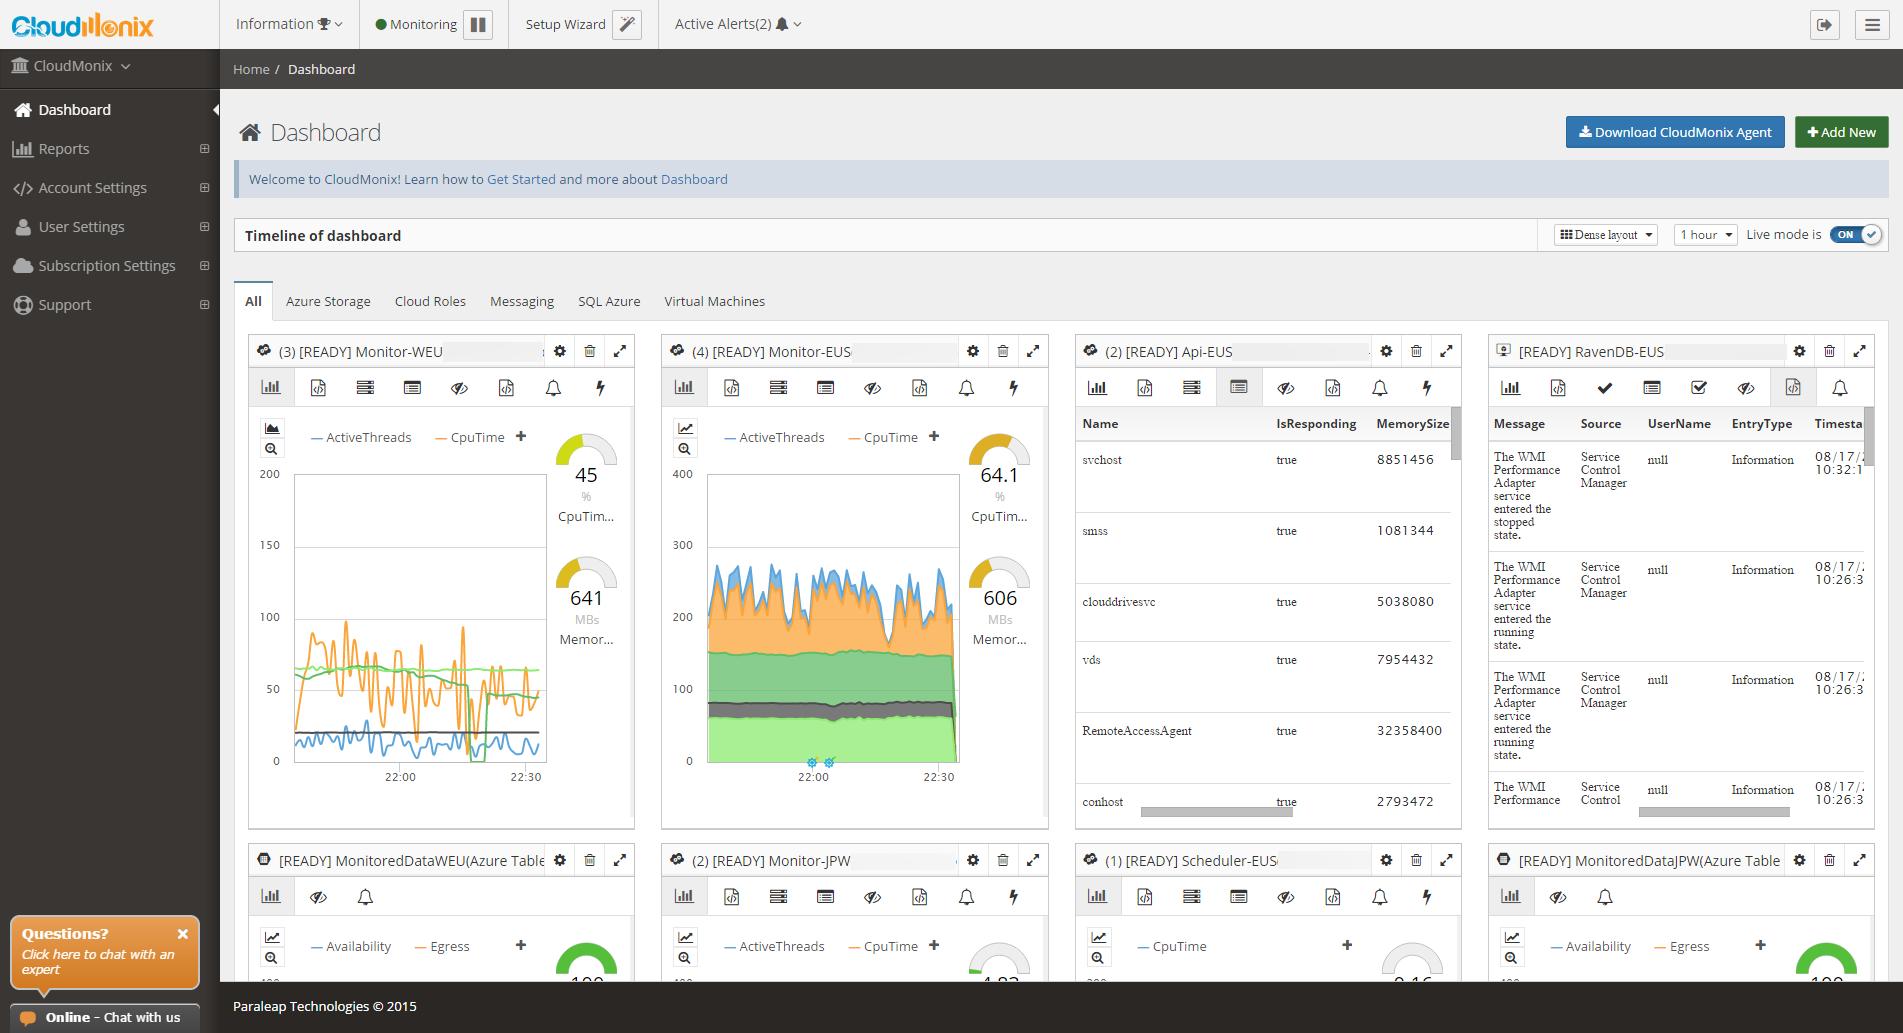 CloudMonix Demo - Dashboard View (condensed)